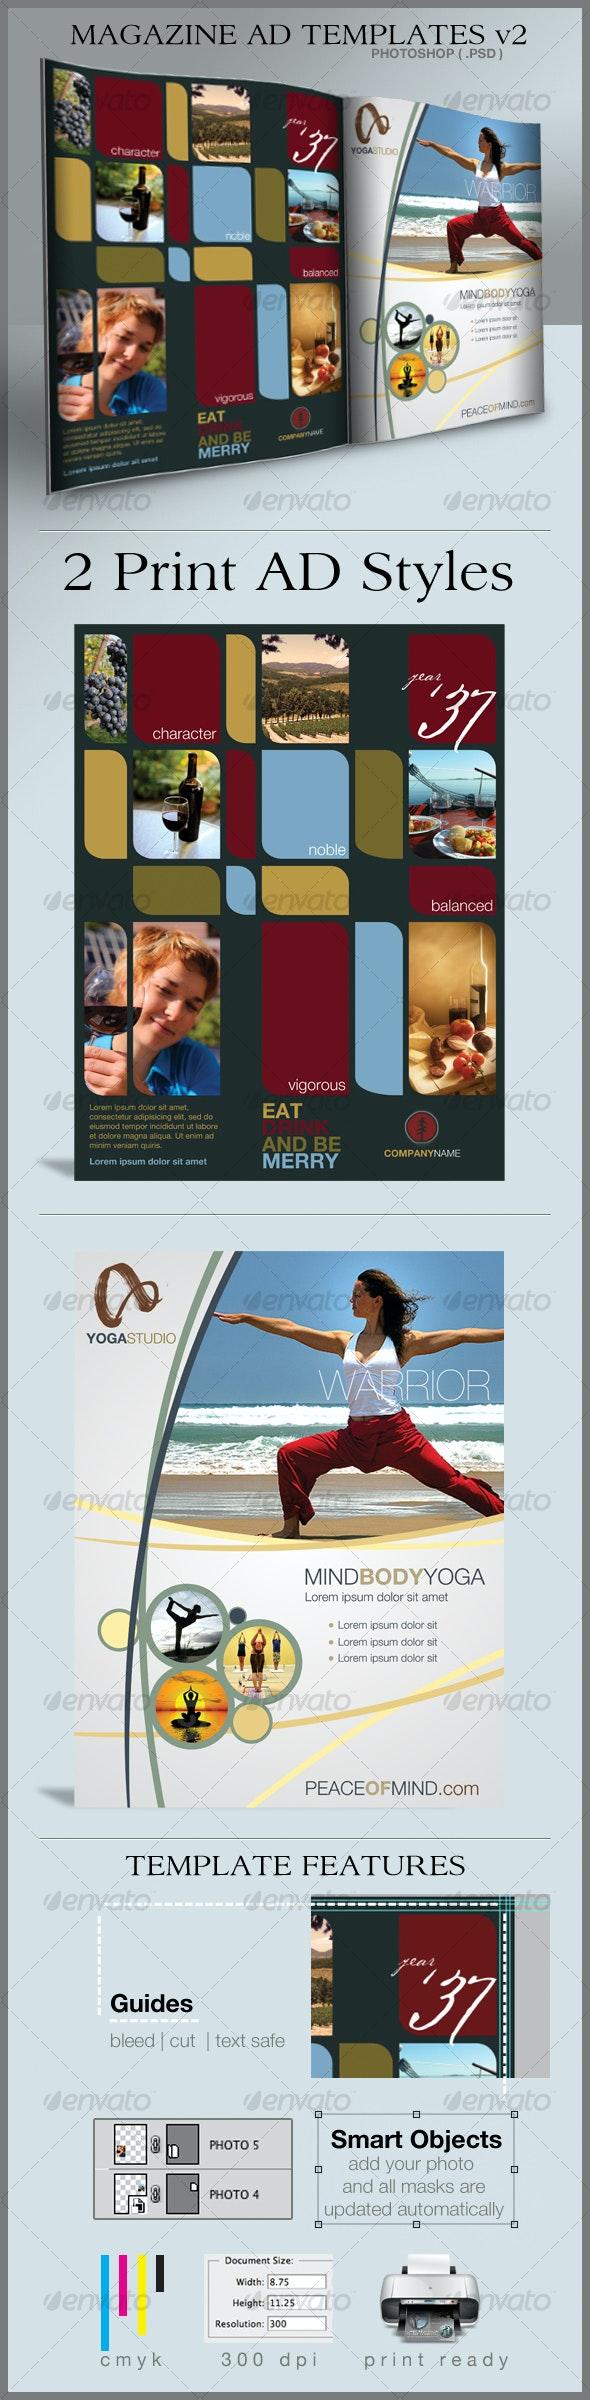 Print Ad Templates v2 - Commerce Flyers